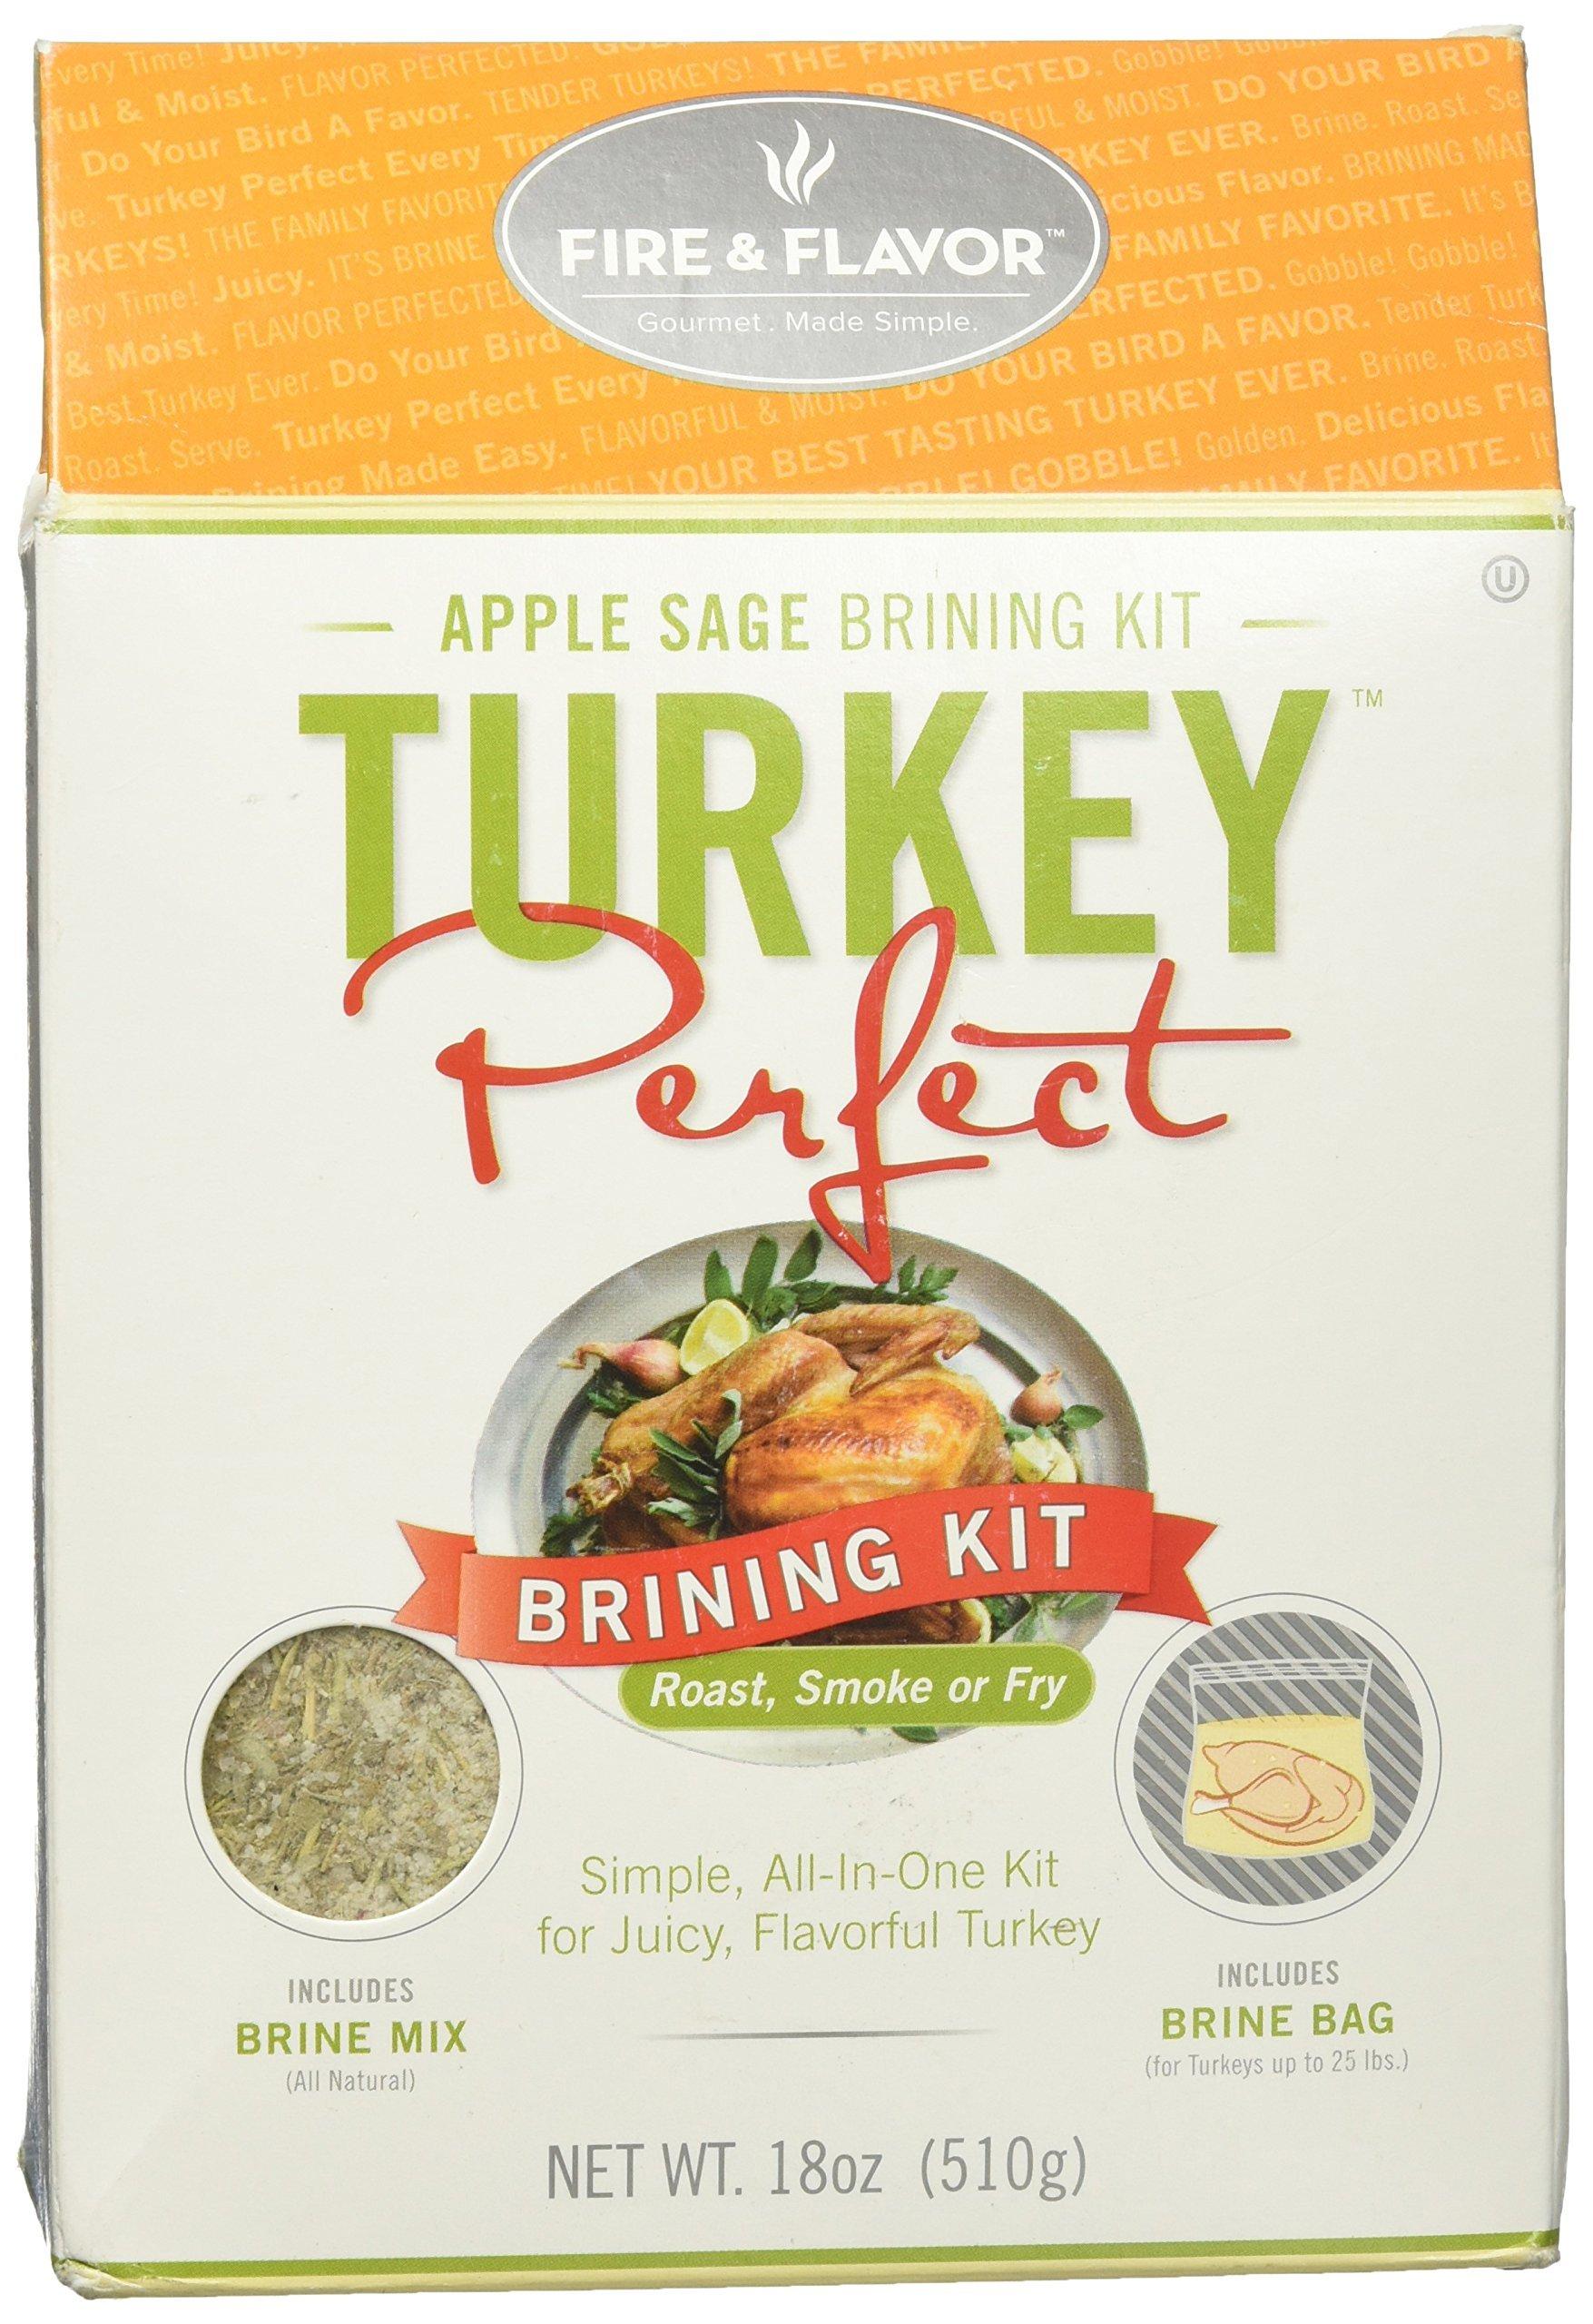 Fire & Flavor Turkey Perfect Brining Kit, Apple Sage,18 oz (510 g)